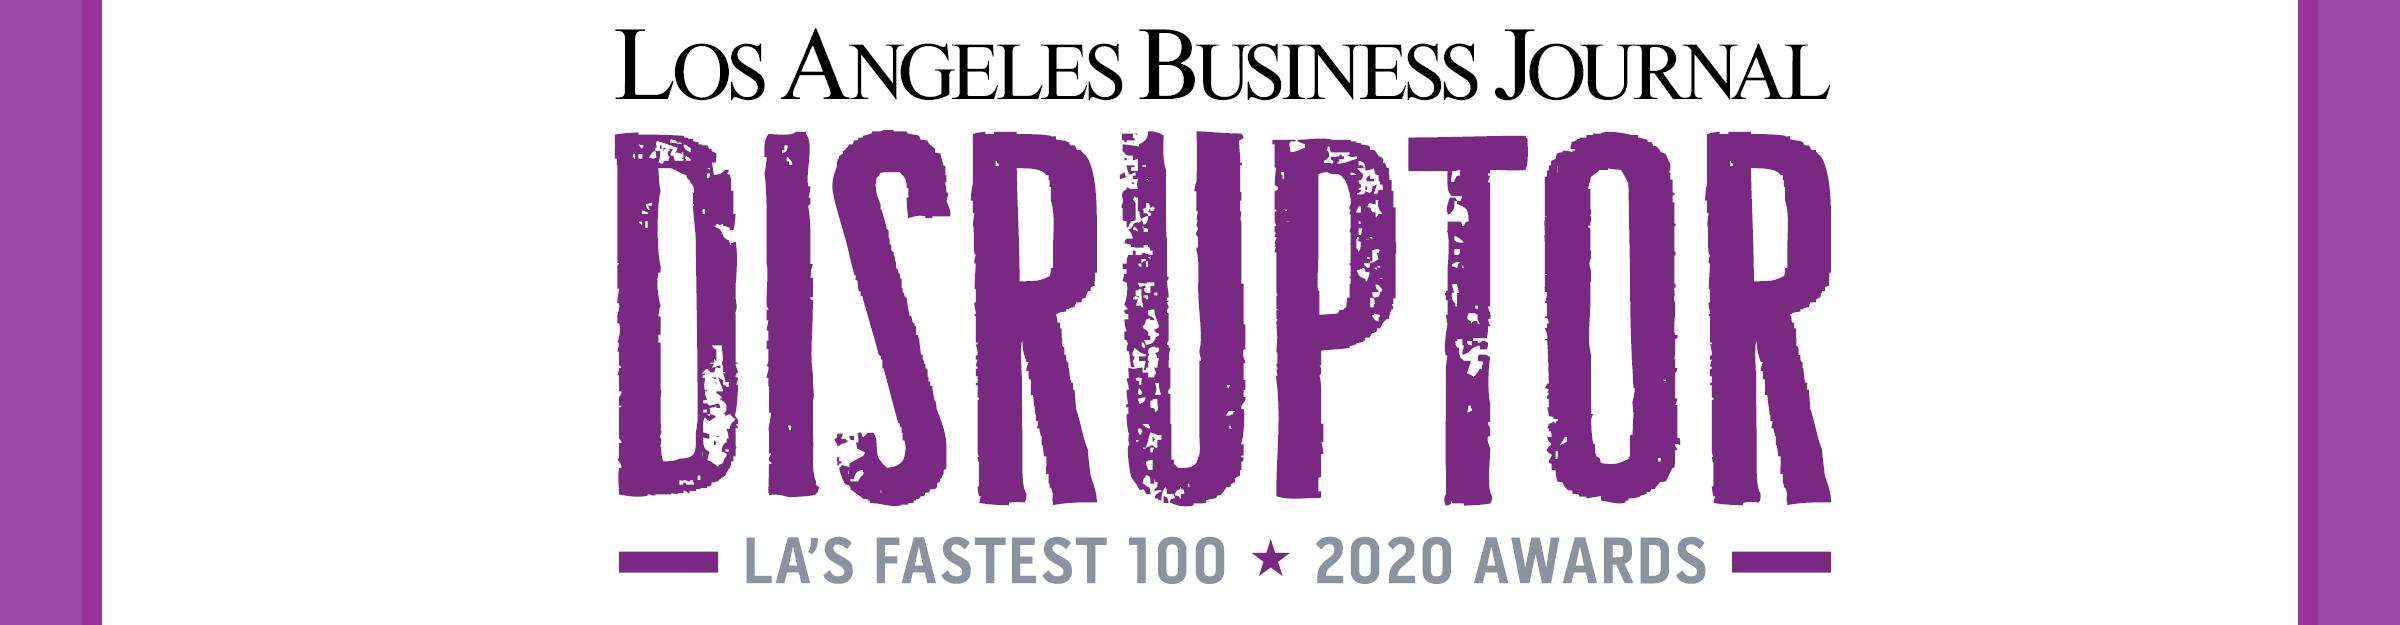 Los Angeles Business Journal Disruptor Awards Event Banner